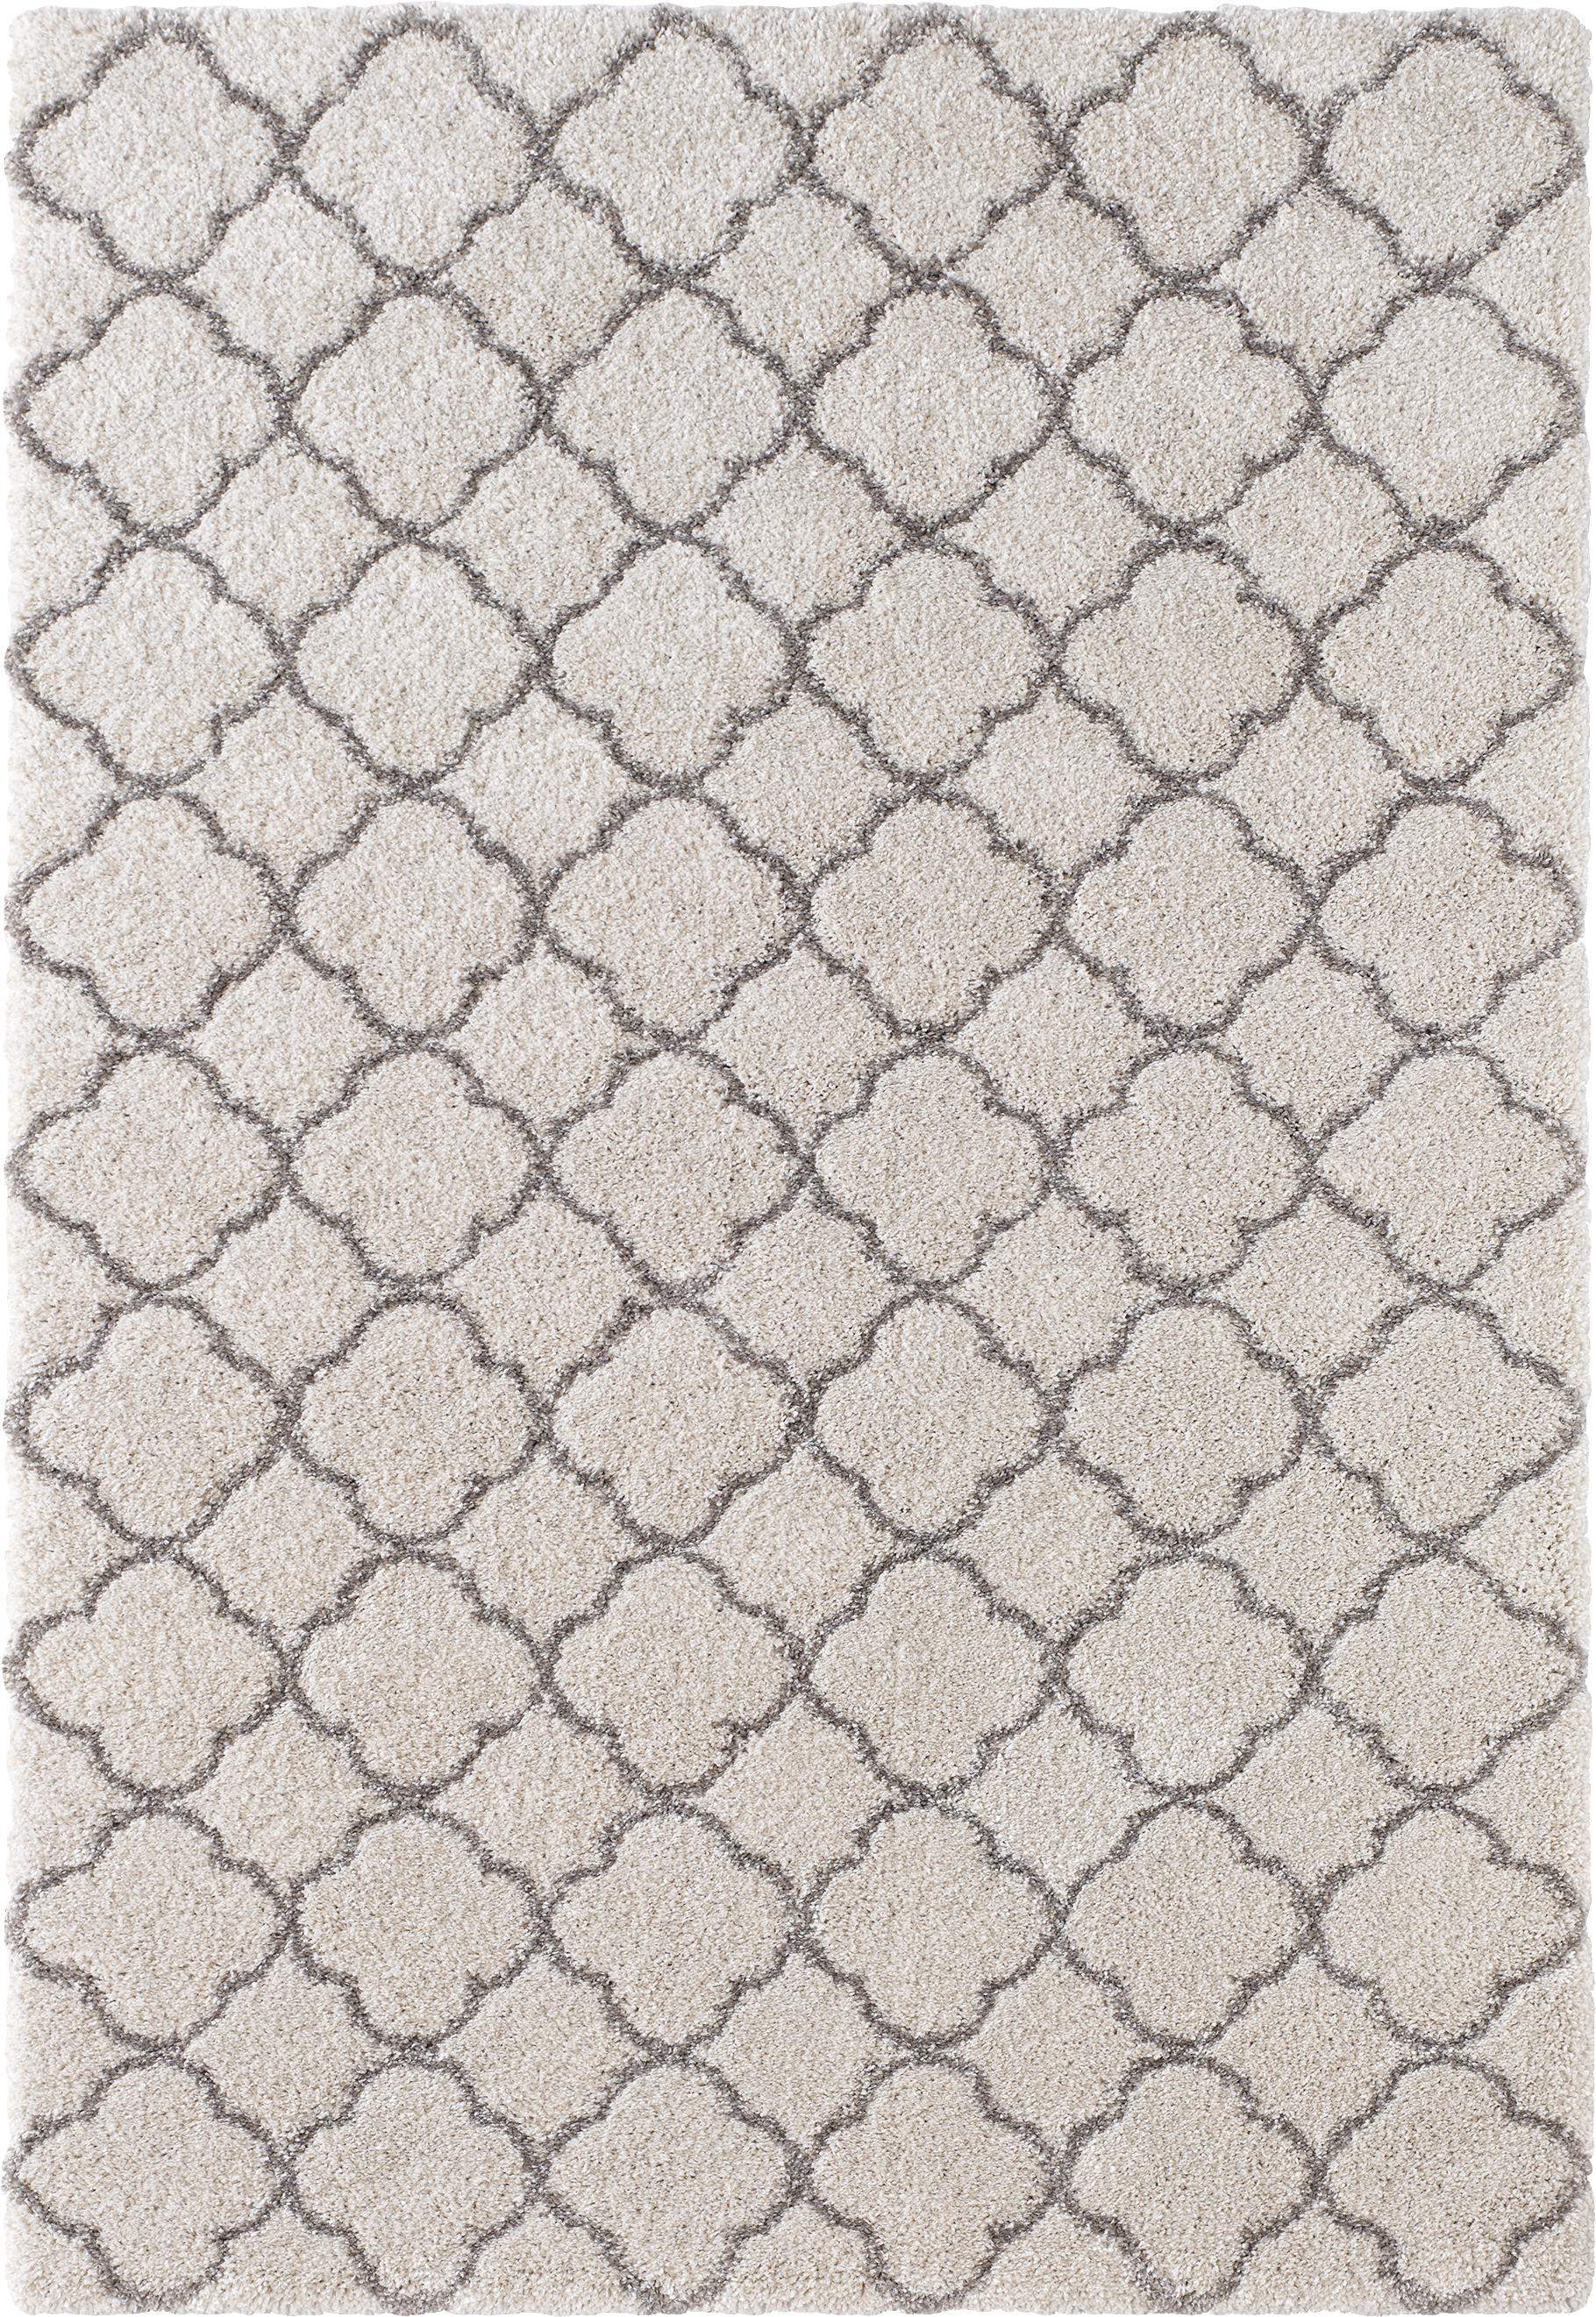 Hochflor-Teppich Grace in Creme/Grau, Flor: 100% Polypropylen, Creme, Grau, B 80 x L 150 cm (Grösse XS)